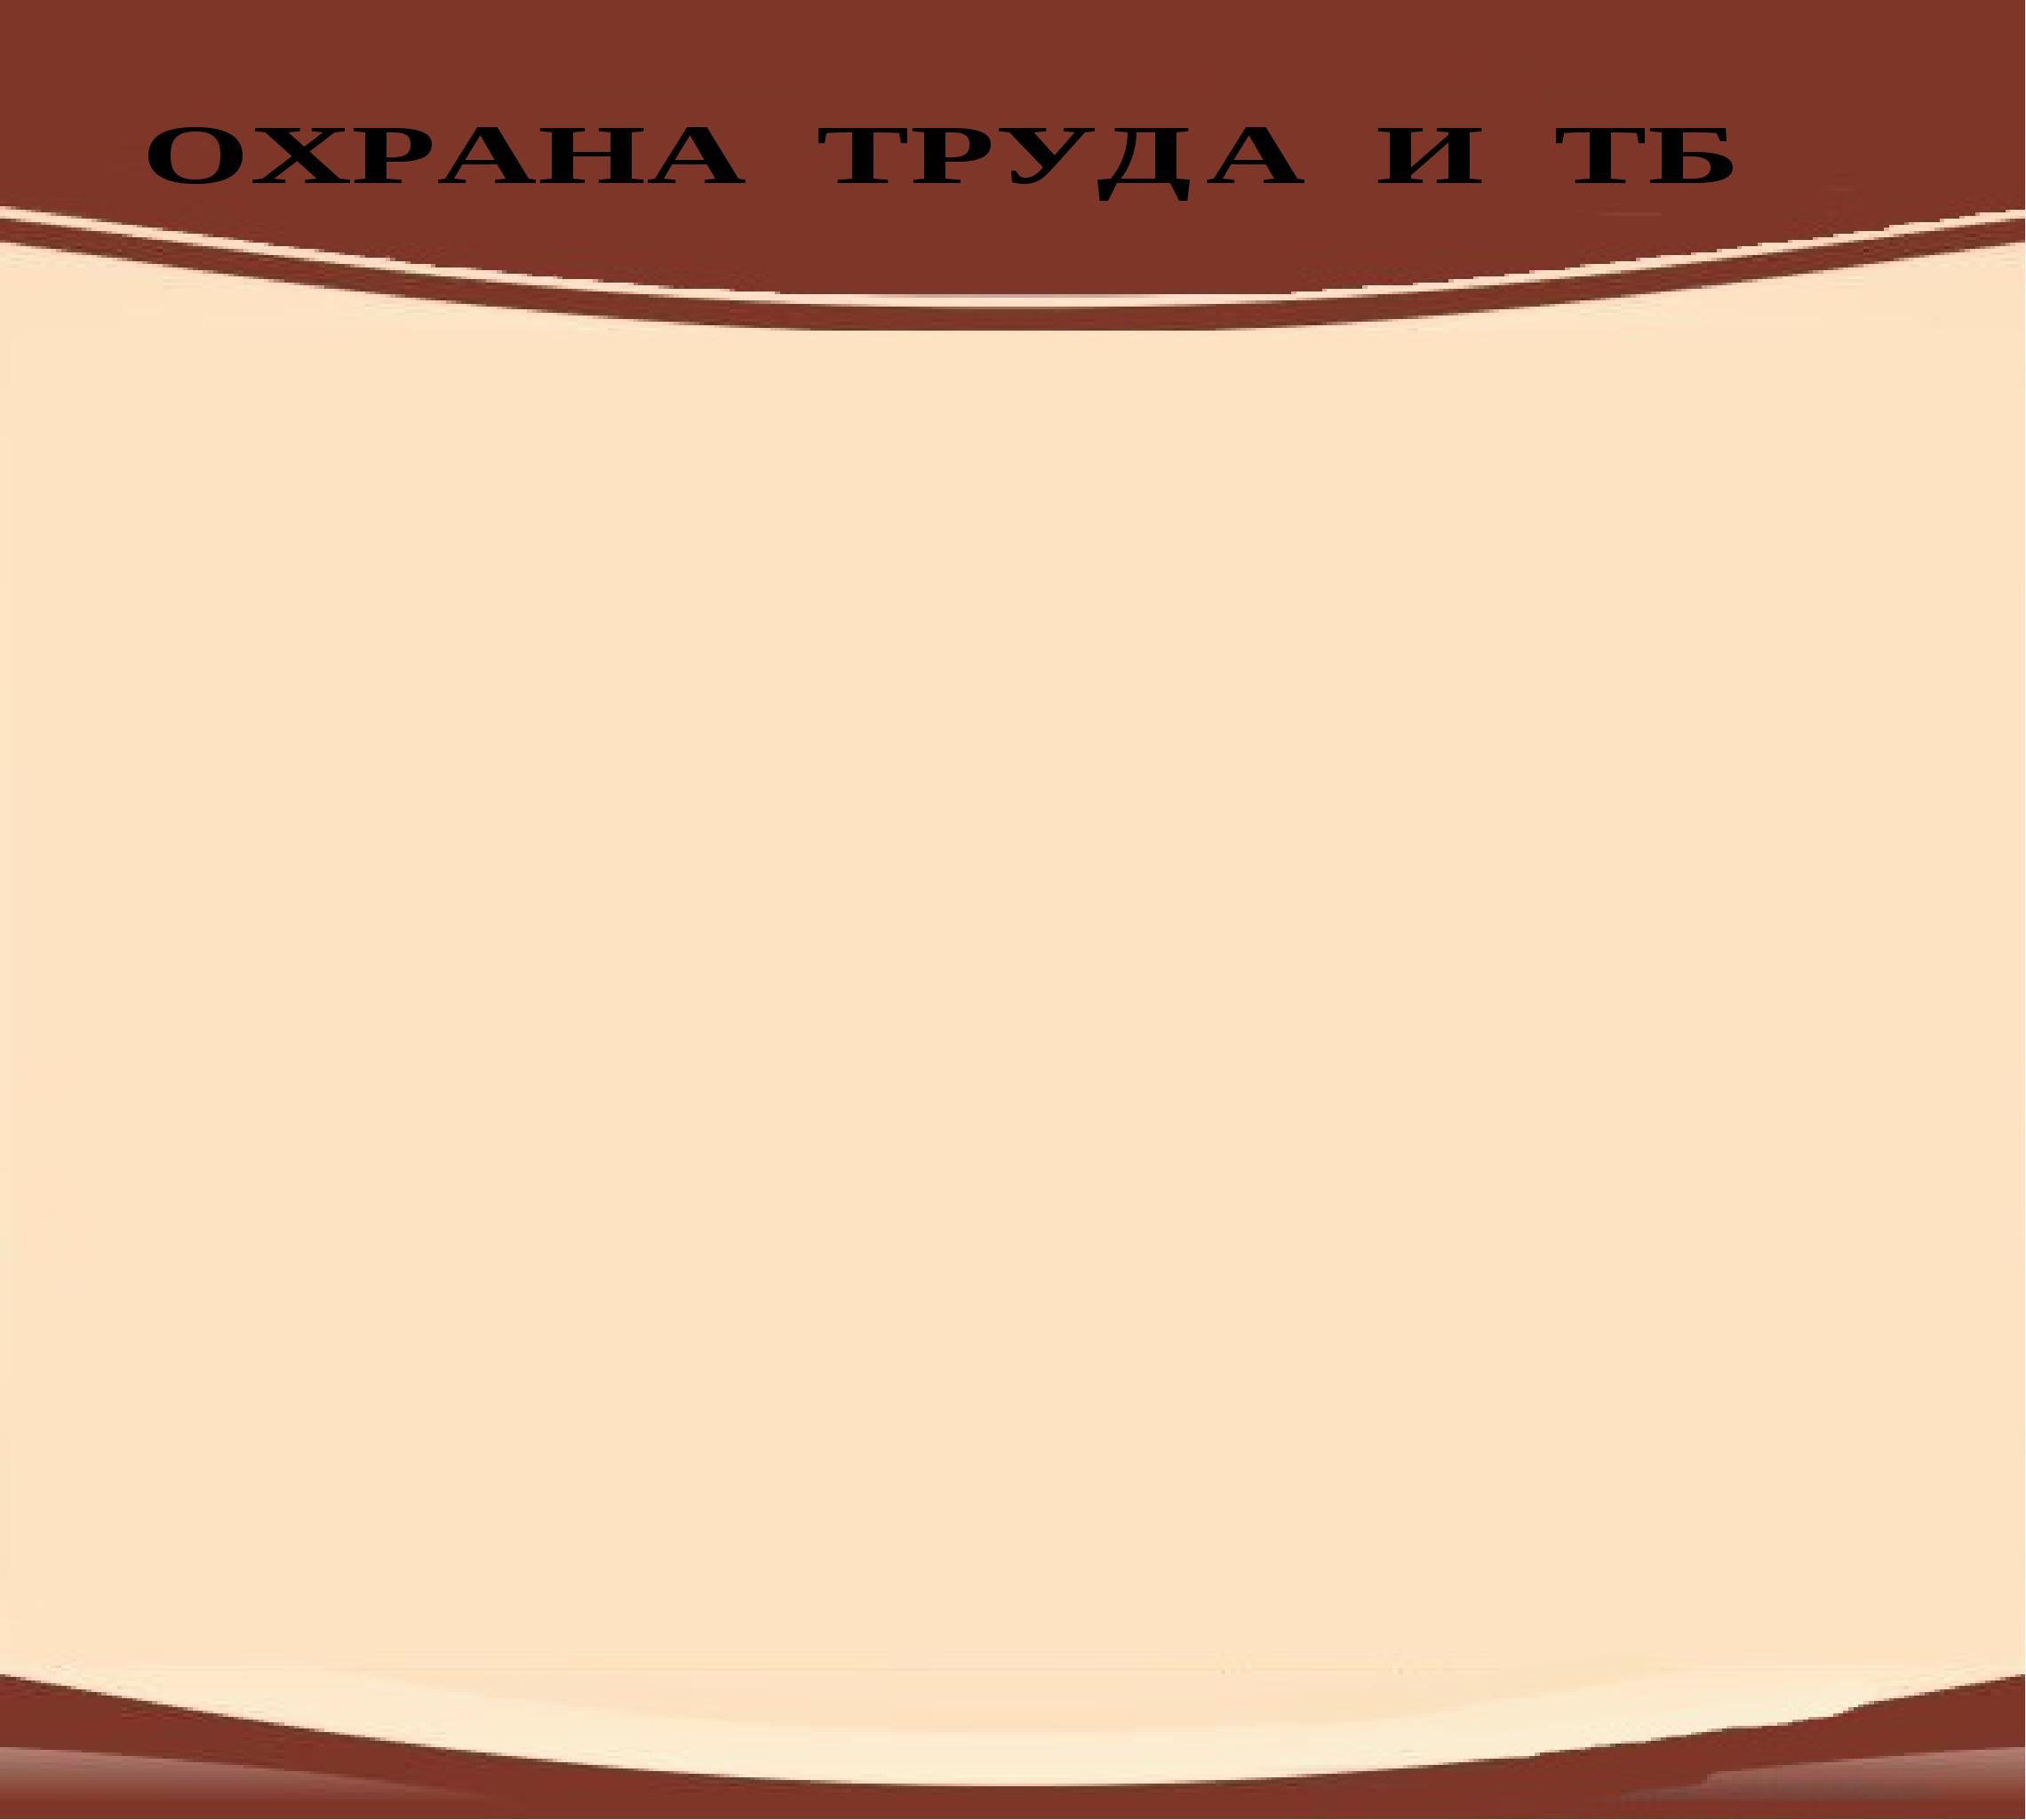 ОХРАНА ТРУДА И ТБ